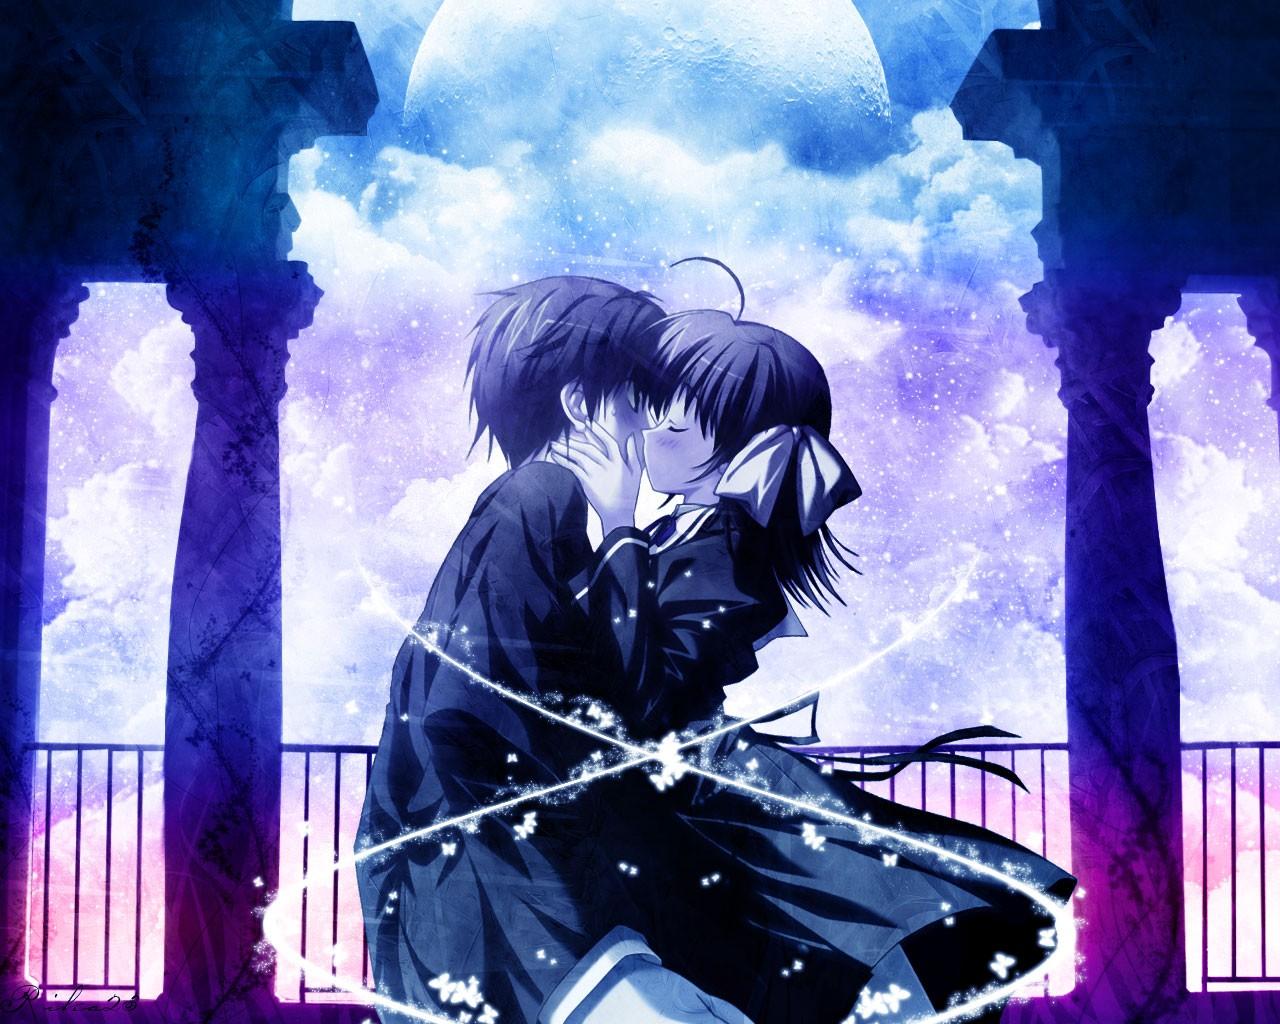 http://4.bp.blogspot.com/-Bi1dd2sESH0/UEjwjKcg8eI/AAAAAAAABLM/u8Ju3Ojhi7c/s1600/Anime+Love+Wallpapers+(7).jpg